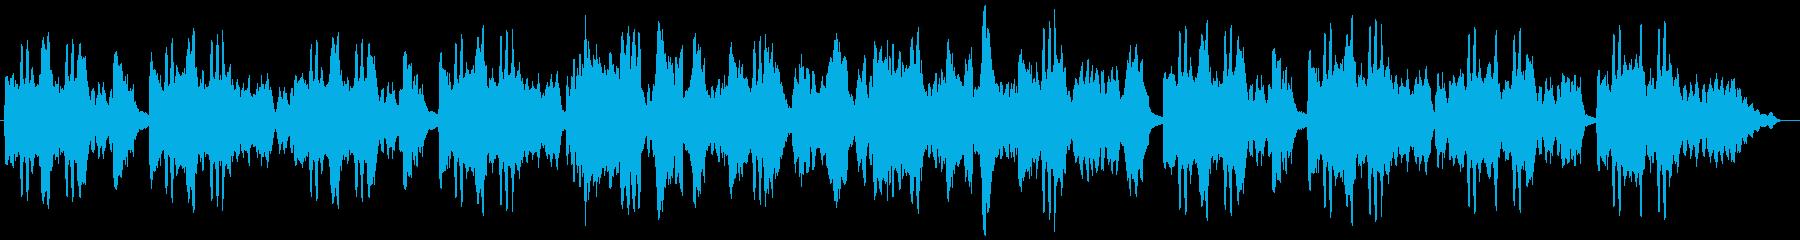 Flute Pf シンプル 田舎感の再生済みの波形